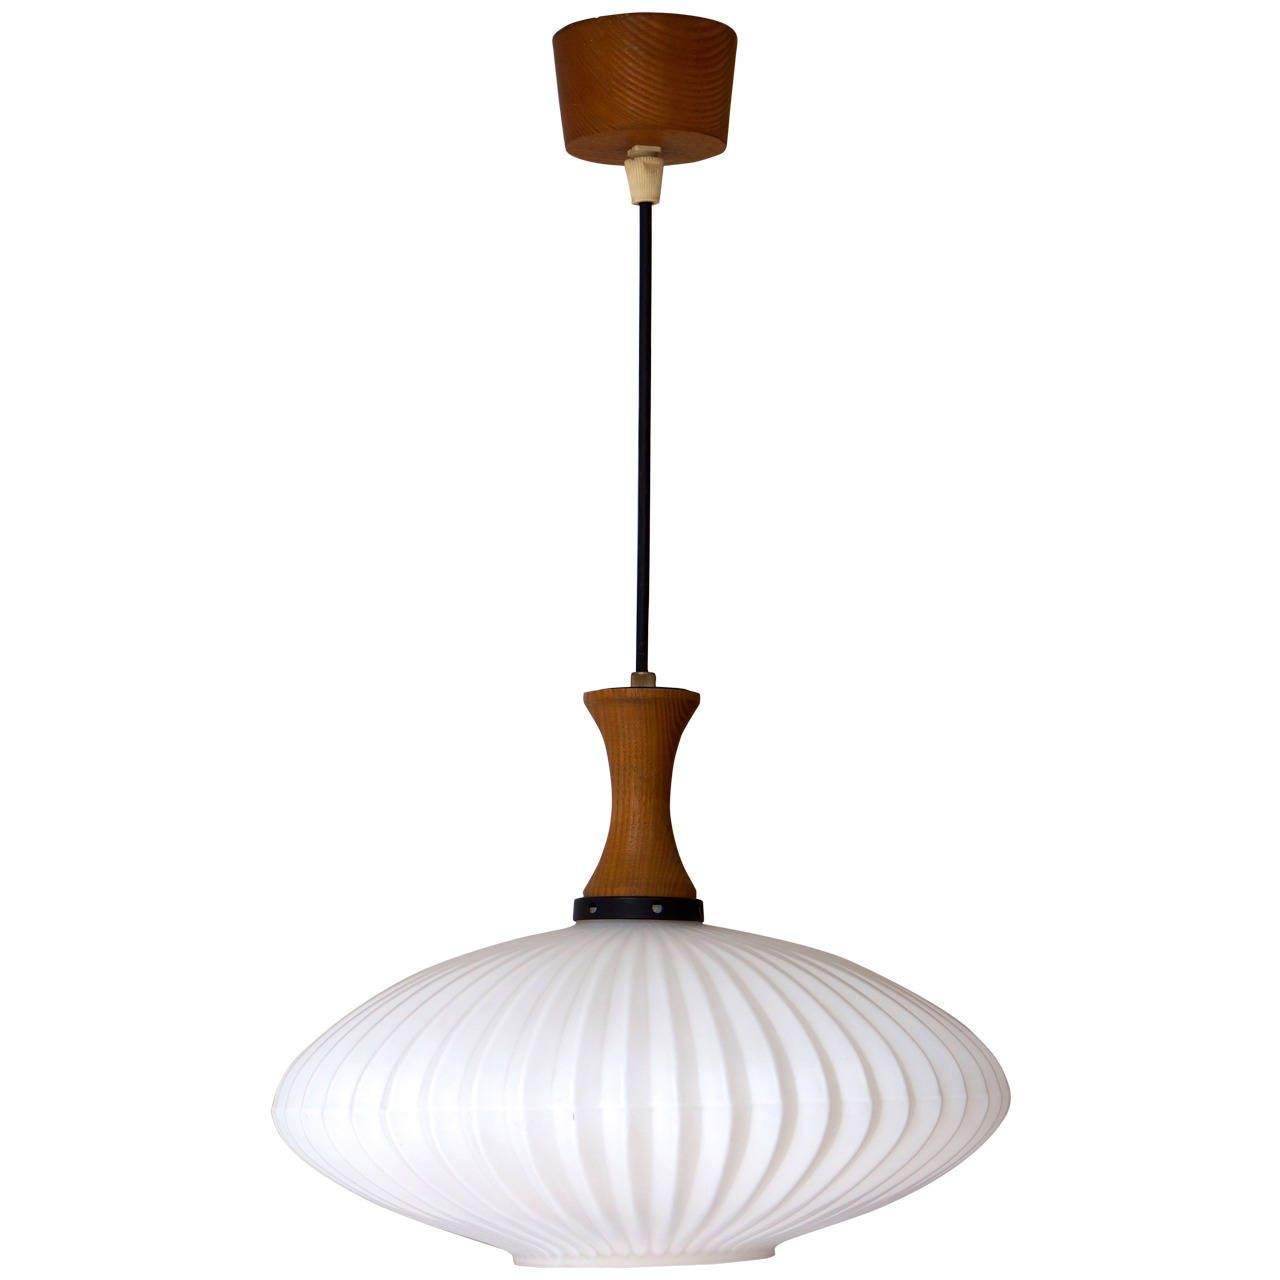 mid century pendant lighting. Mid-Century Danish Glass And Wood Chandelier - Pendant Light Mid Century Lighting H